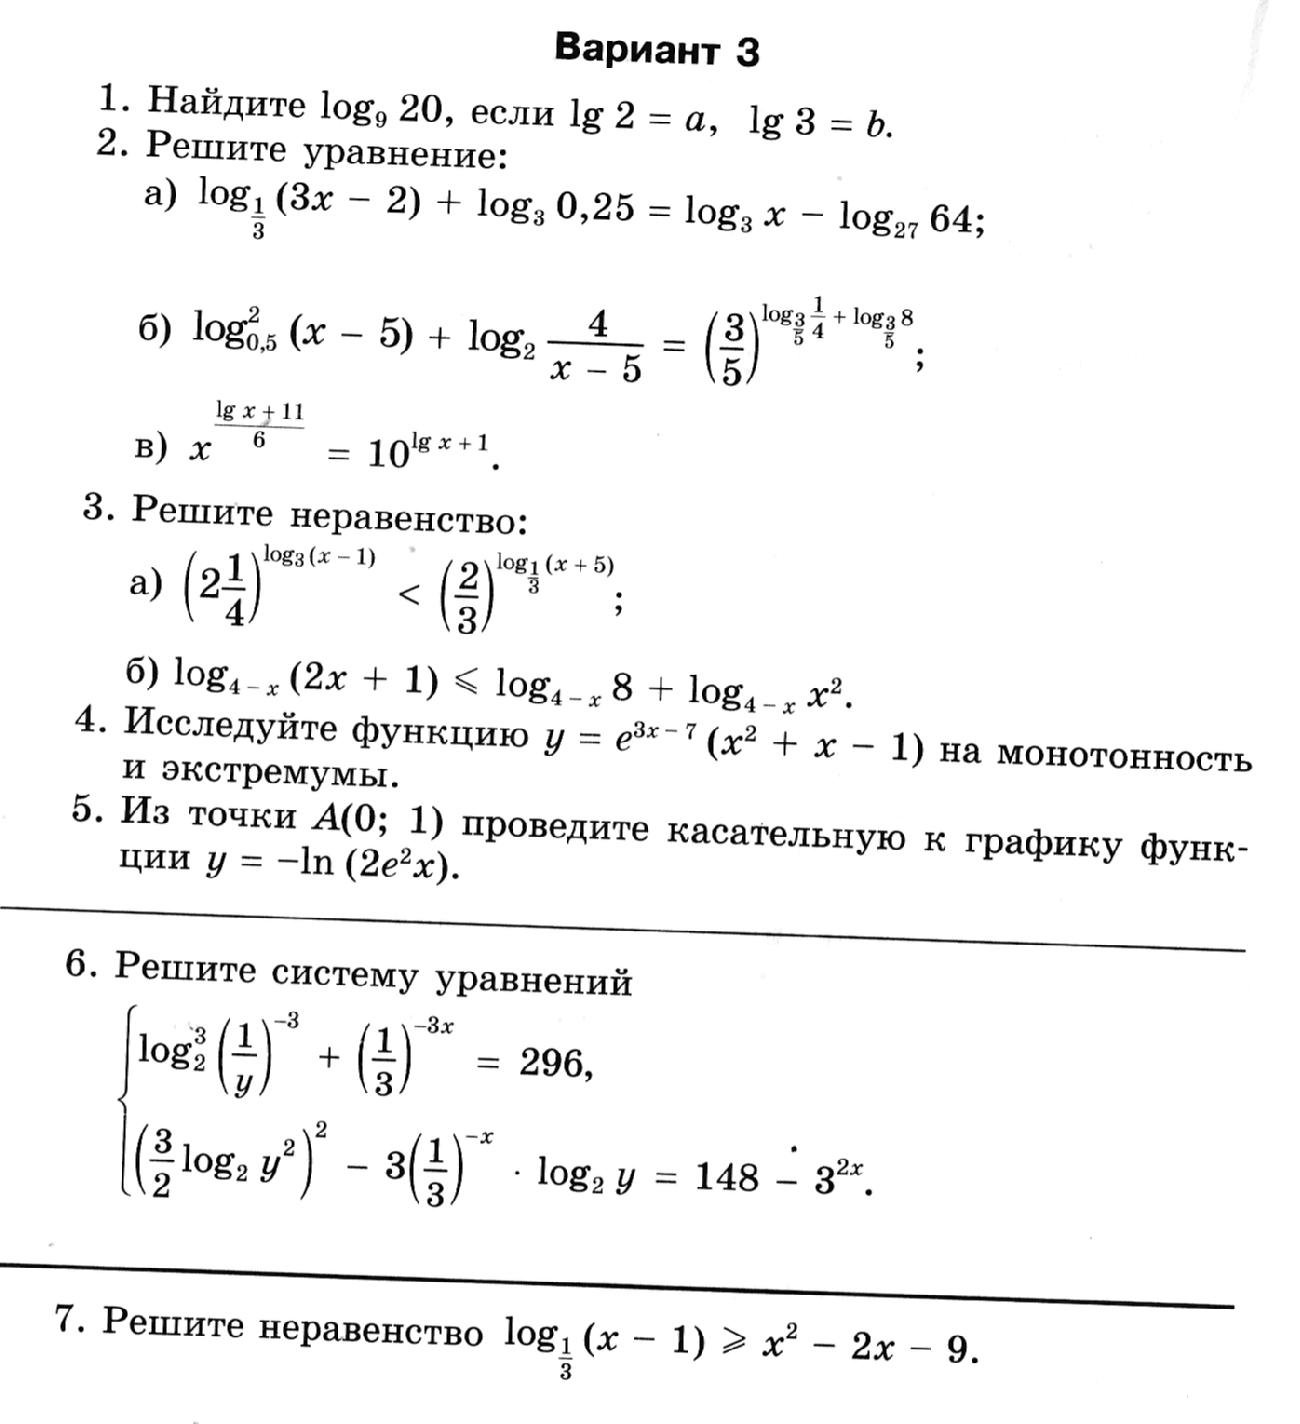 РАБОЧАЯ ПРОГРАММА по алгебре и началам анализа класс  hello html m6666b283 png hello html 48cc859e png